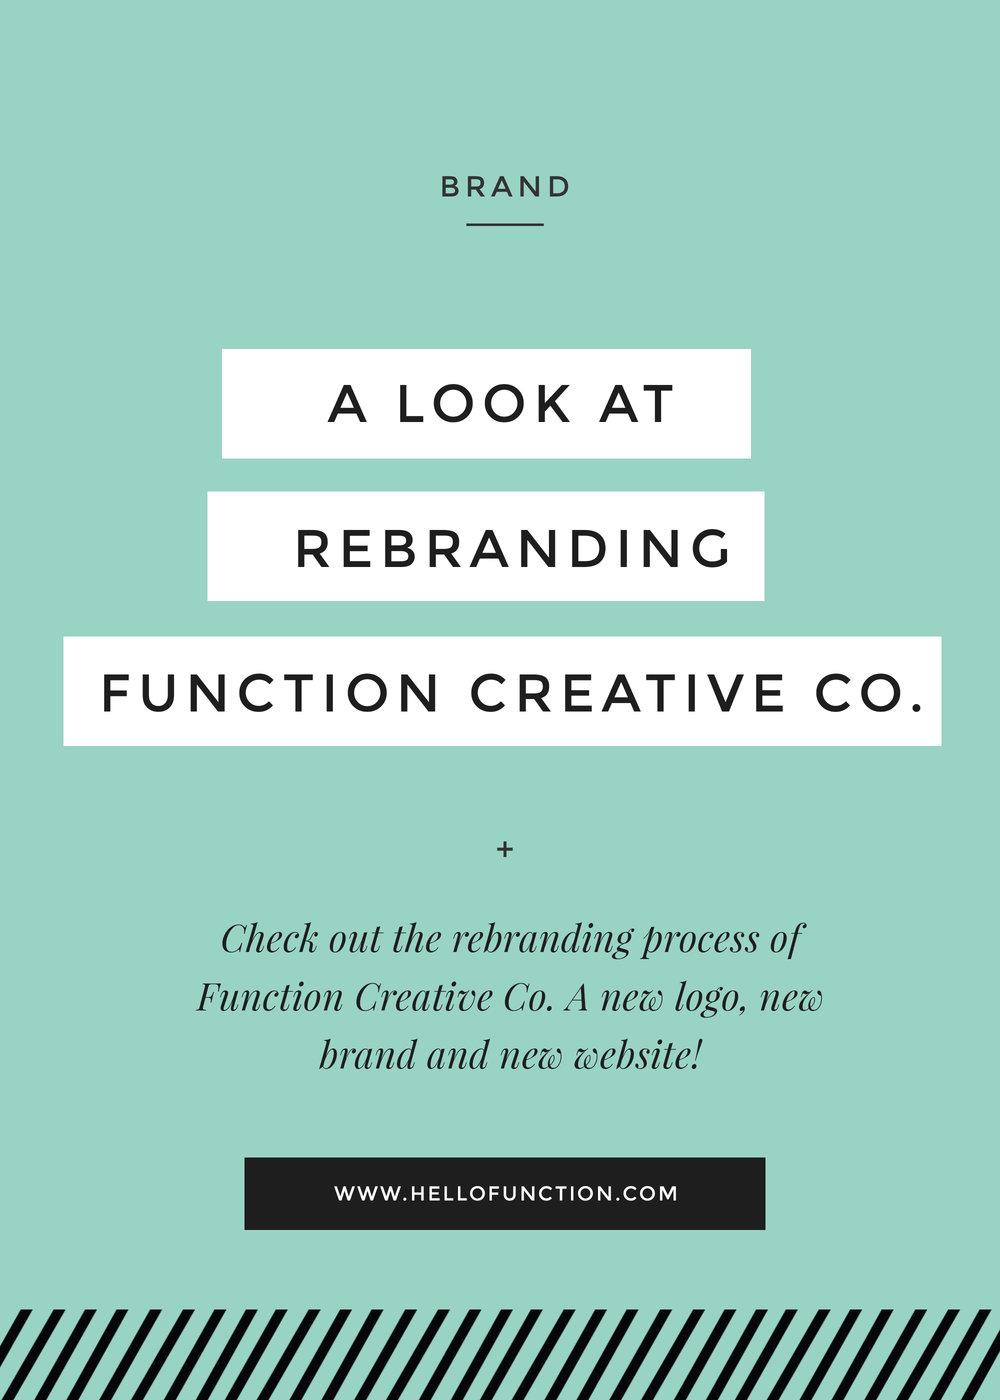 function creative co. rebrand spotlight